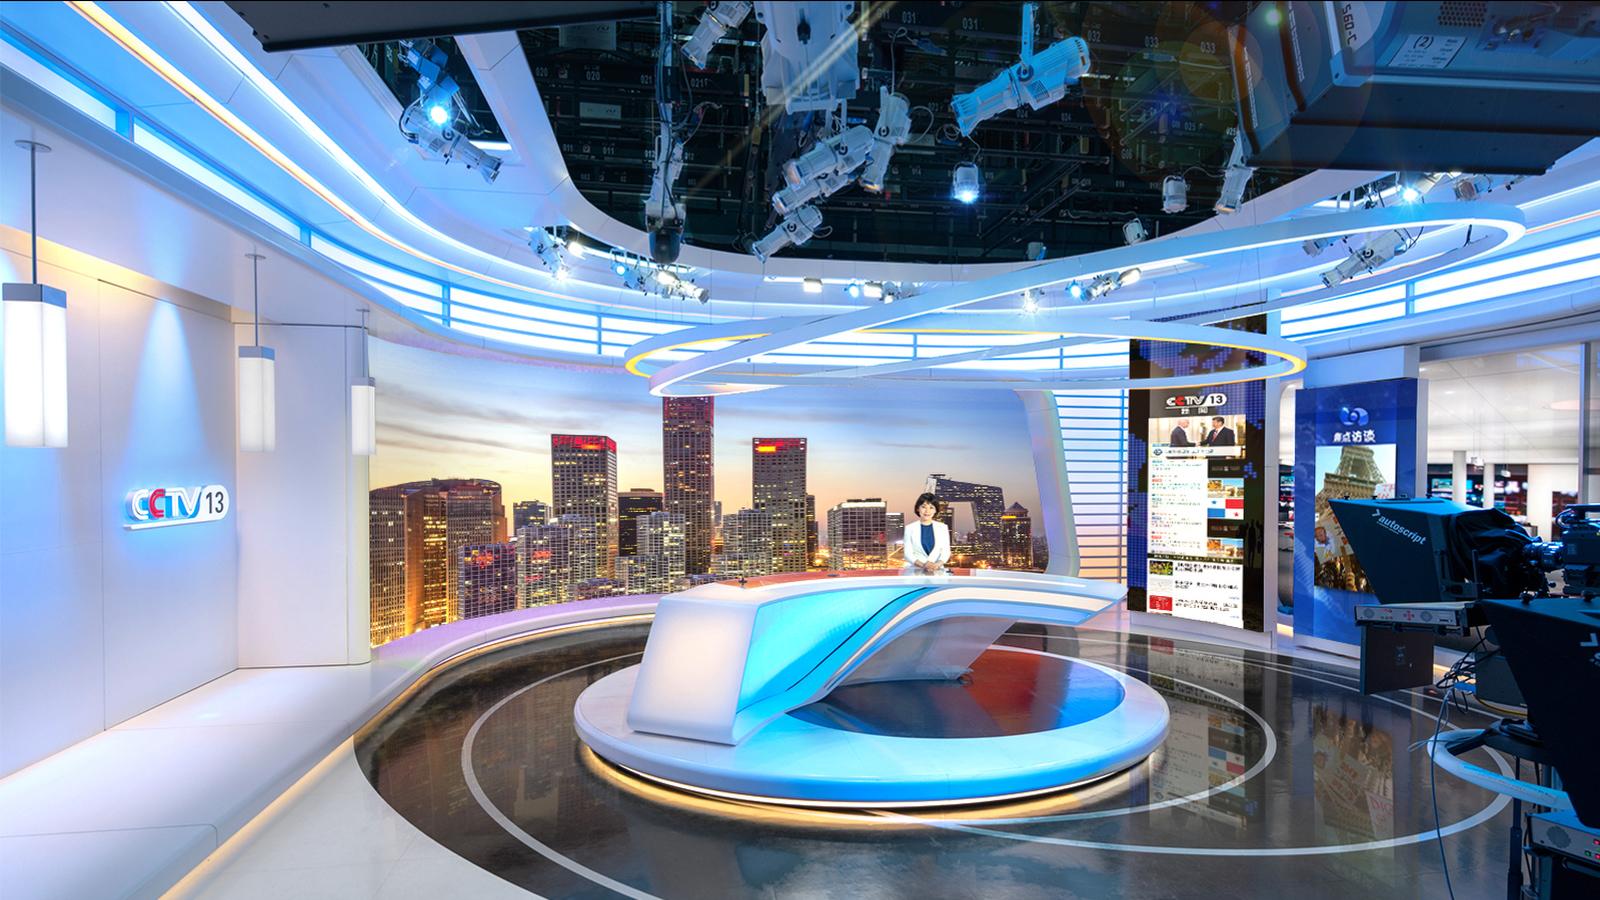 NCS_CCTV13-Set-Design_Clickspring_0008